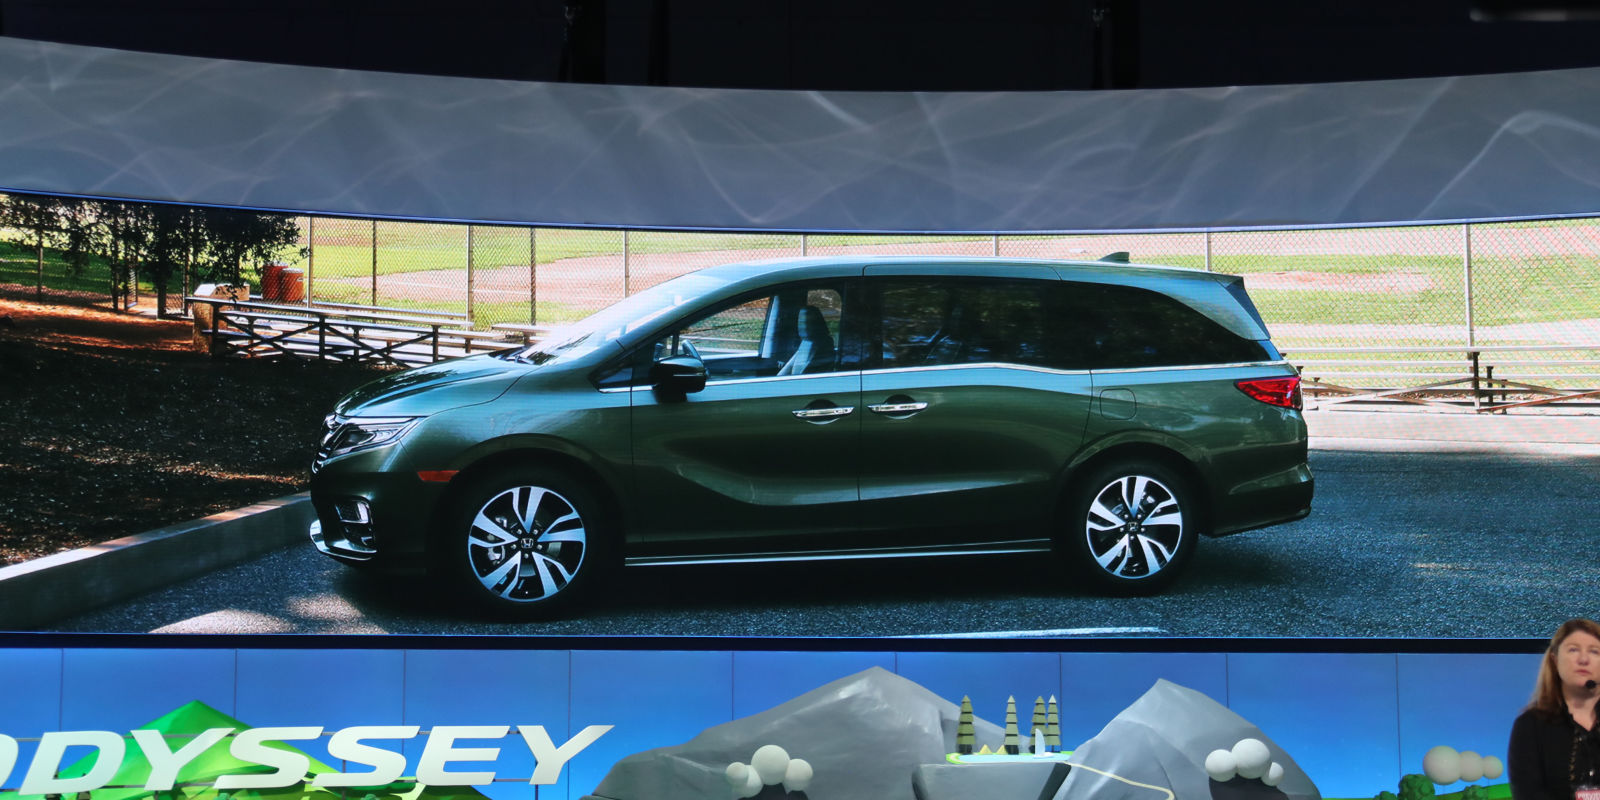 2018 honda odyssey new honda minivan revealed at naias 2017 for Detroit auto show honda odyssey